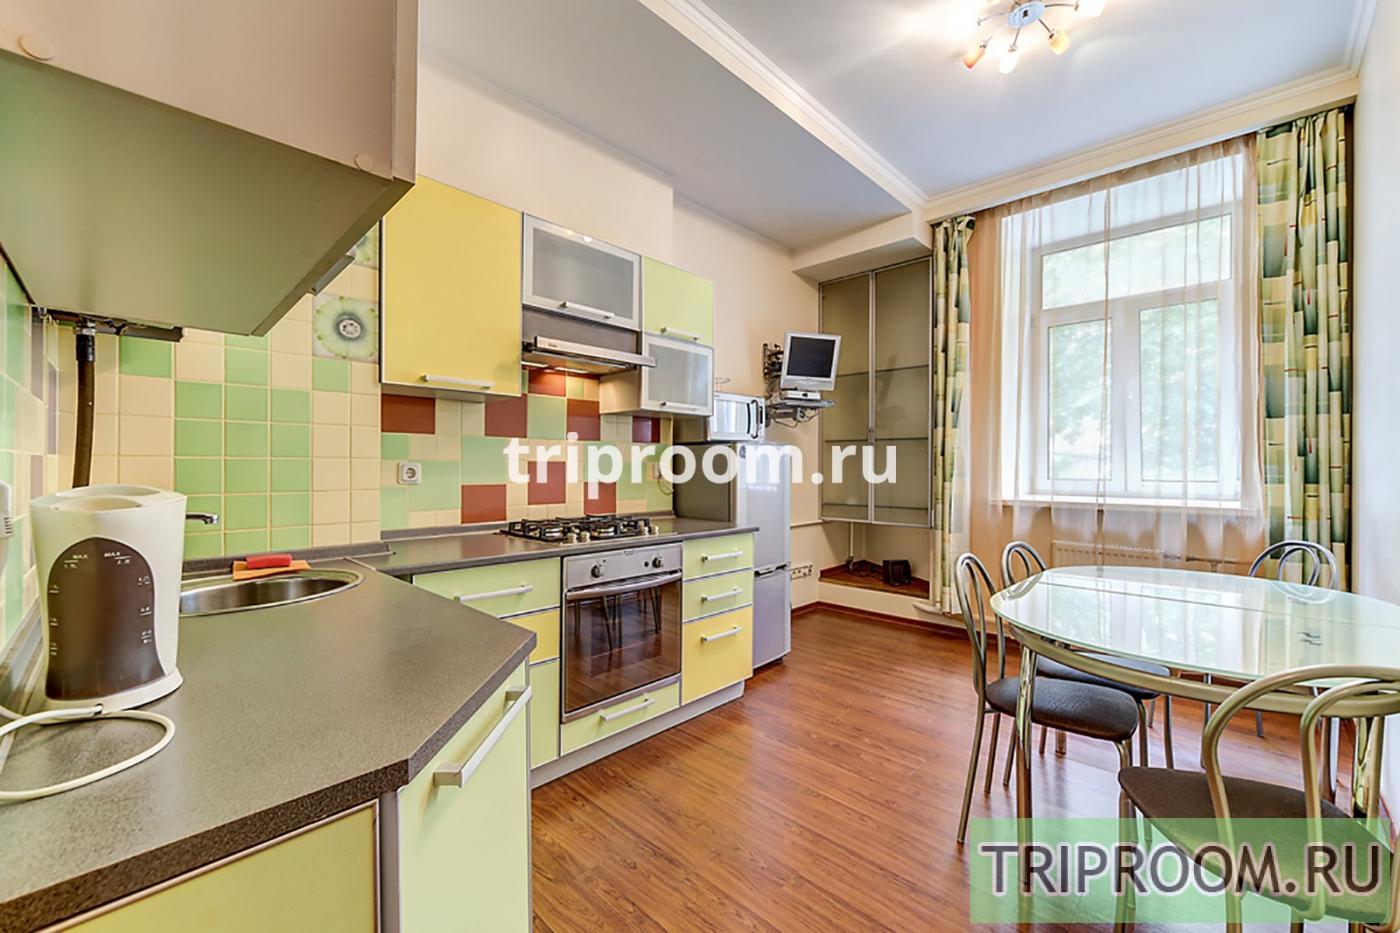 1-комнатная квартира посуточно (вариант № 15527), ул. Канала Грибоедова набережная, фото № 1